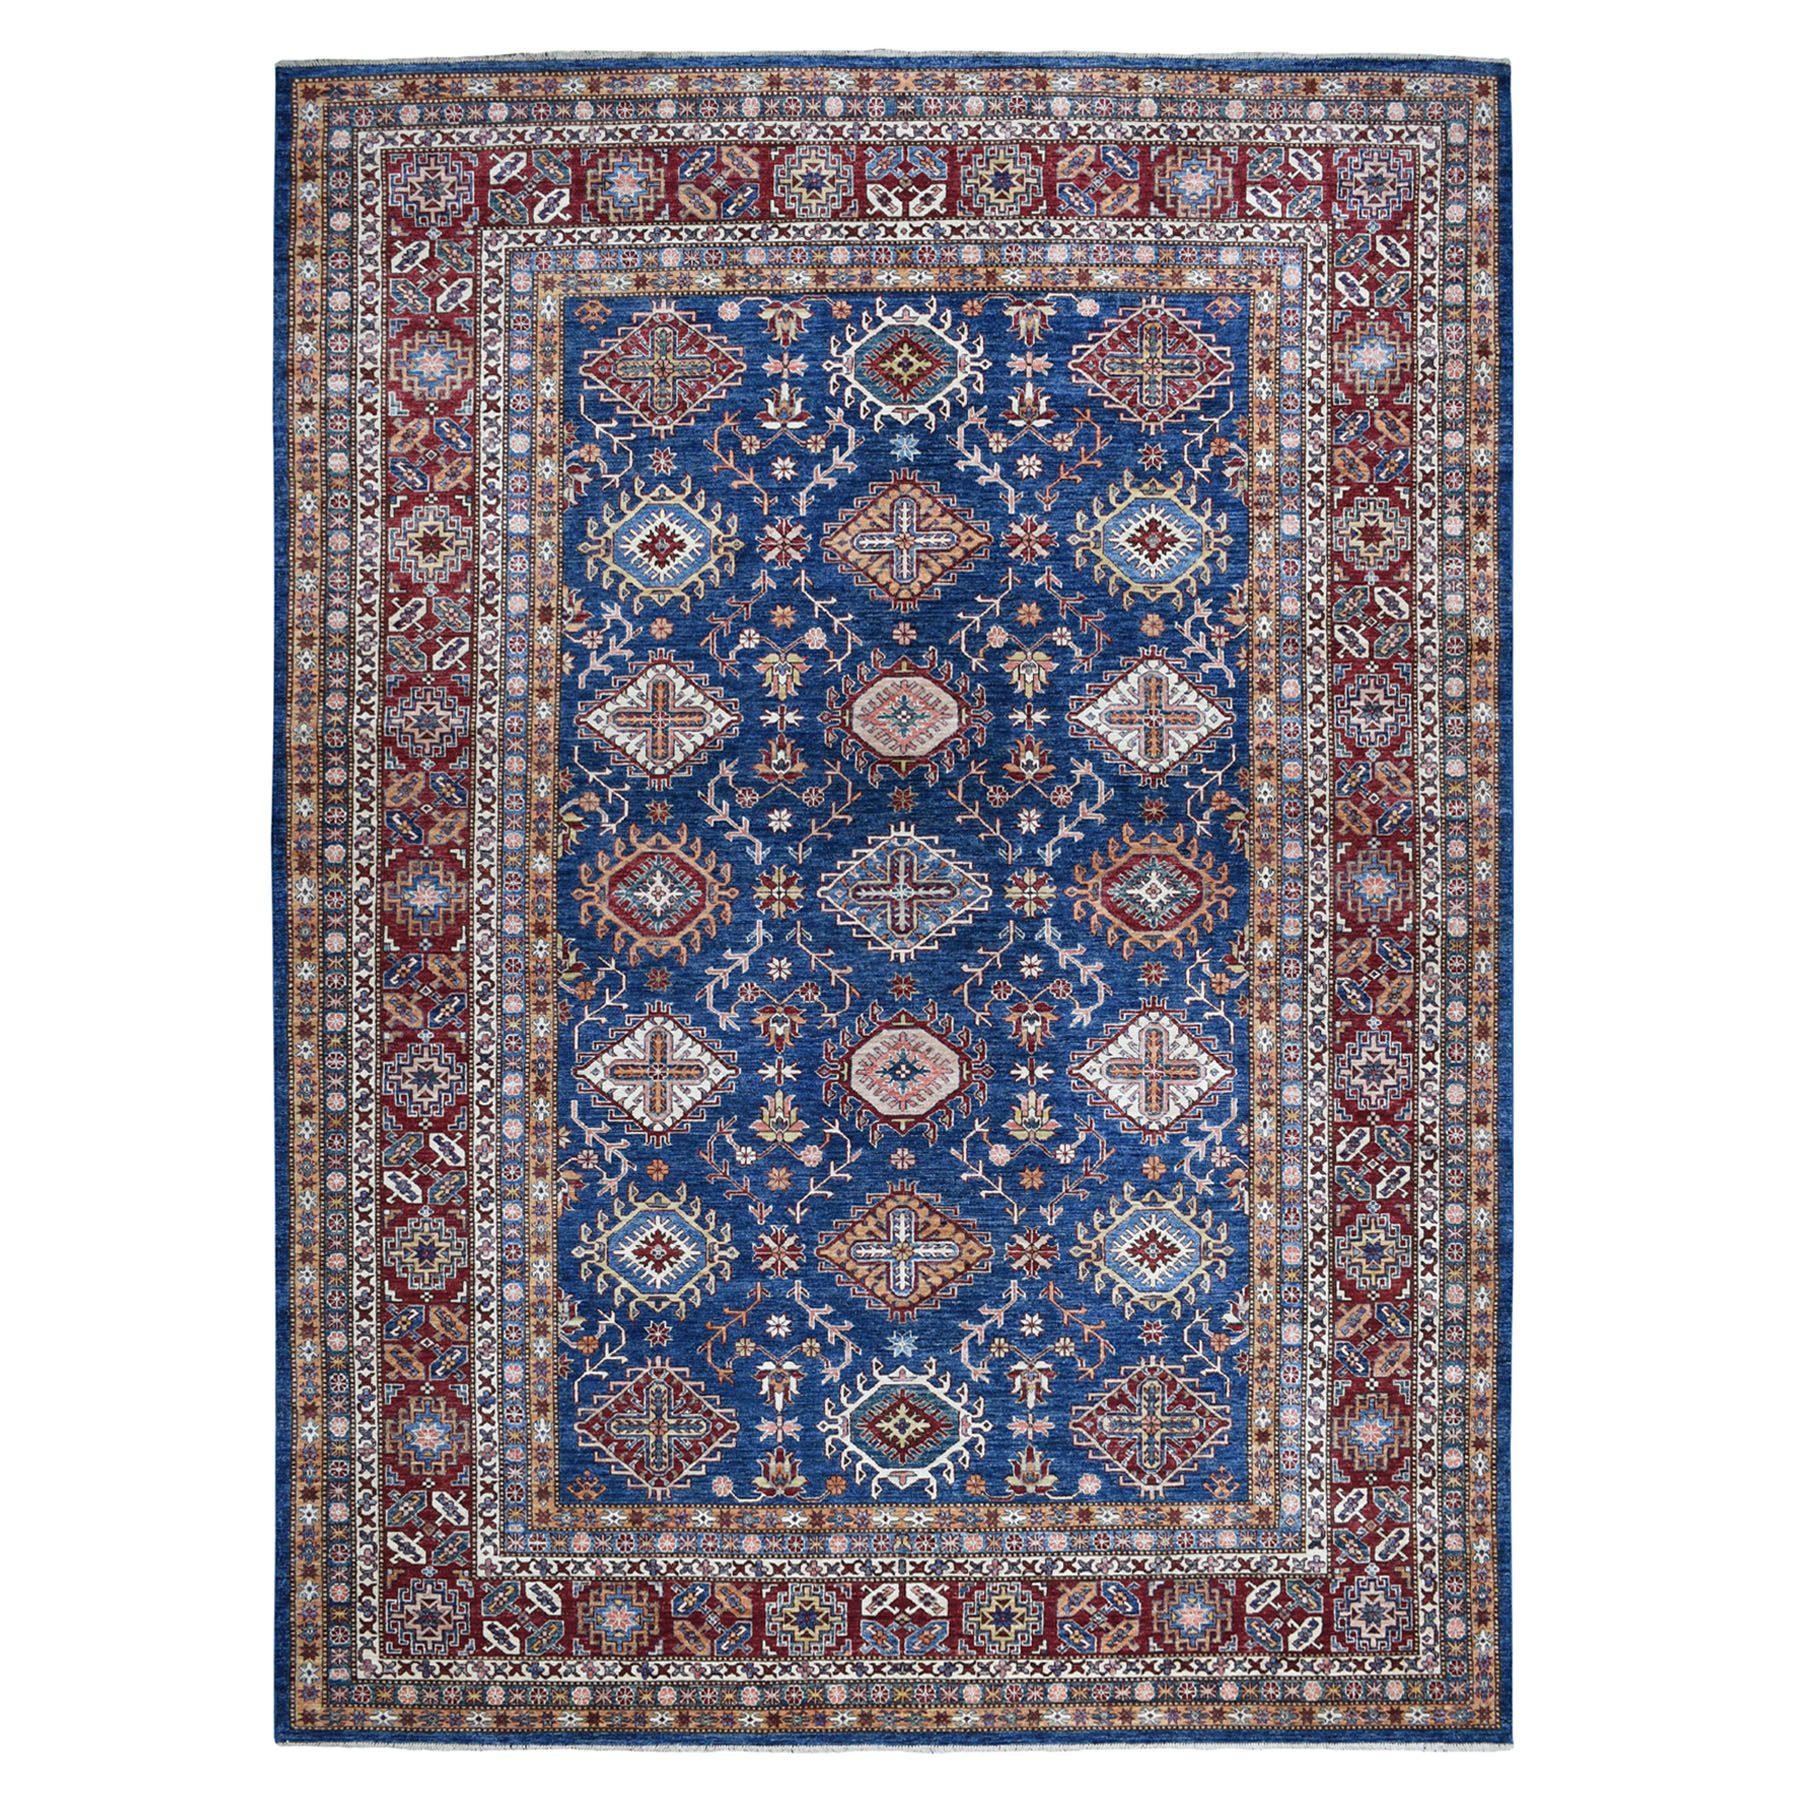 "9'1""X11'10"" Blue Super Kazak Geometric Design Pure Wool Hand-Knotted Oriental Rug moaeaa8e"